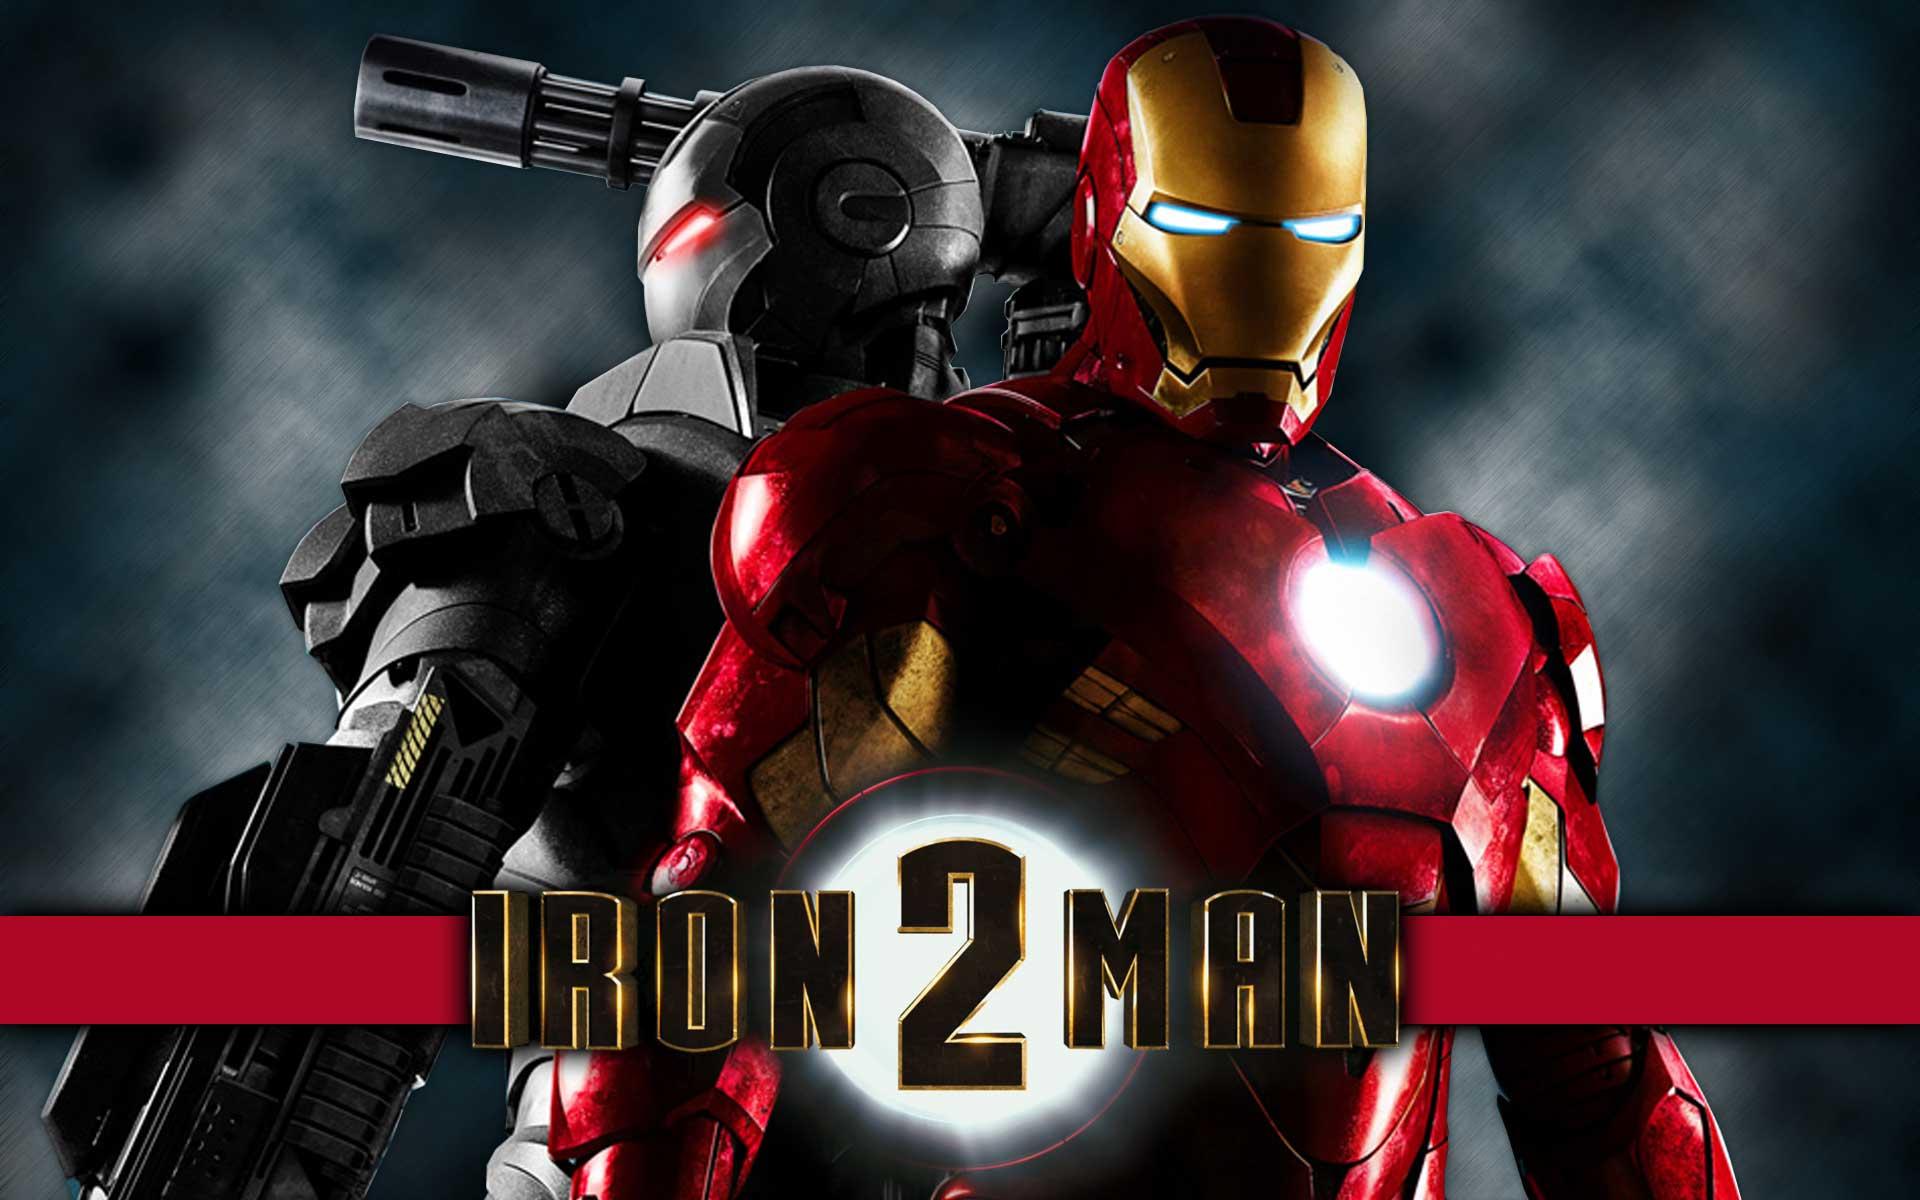 Iron Man 2 Widescreen Wallpapers HD Wallpapers 1920x1200